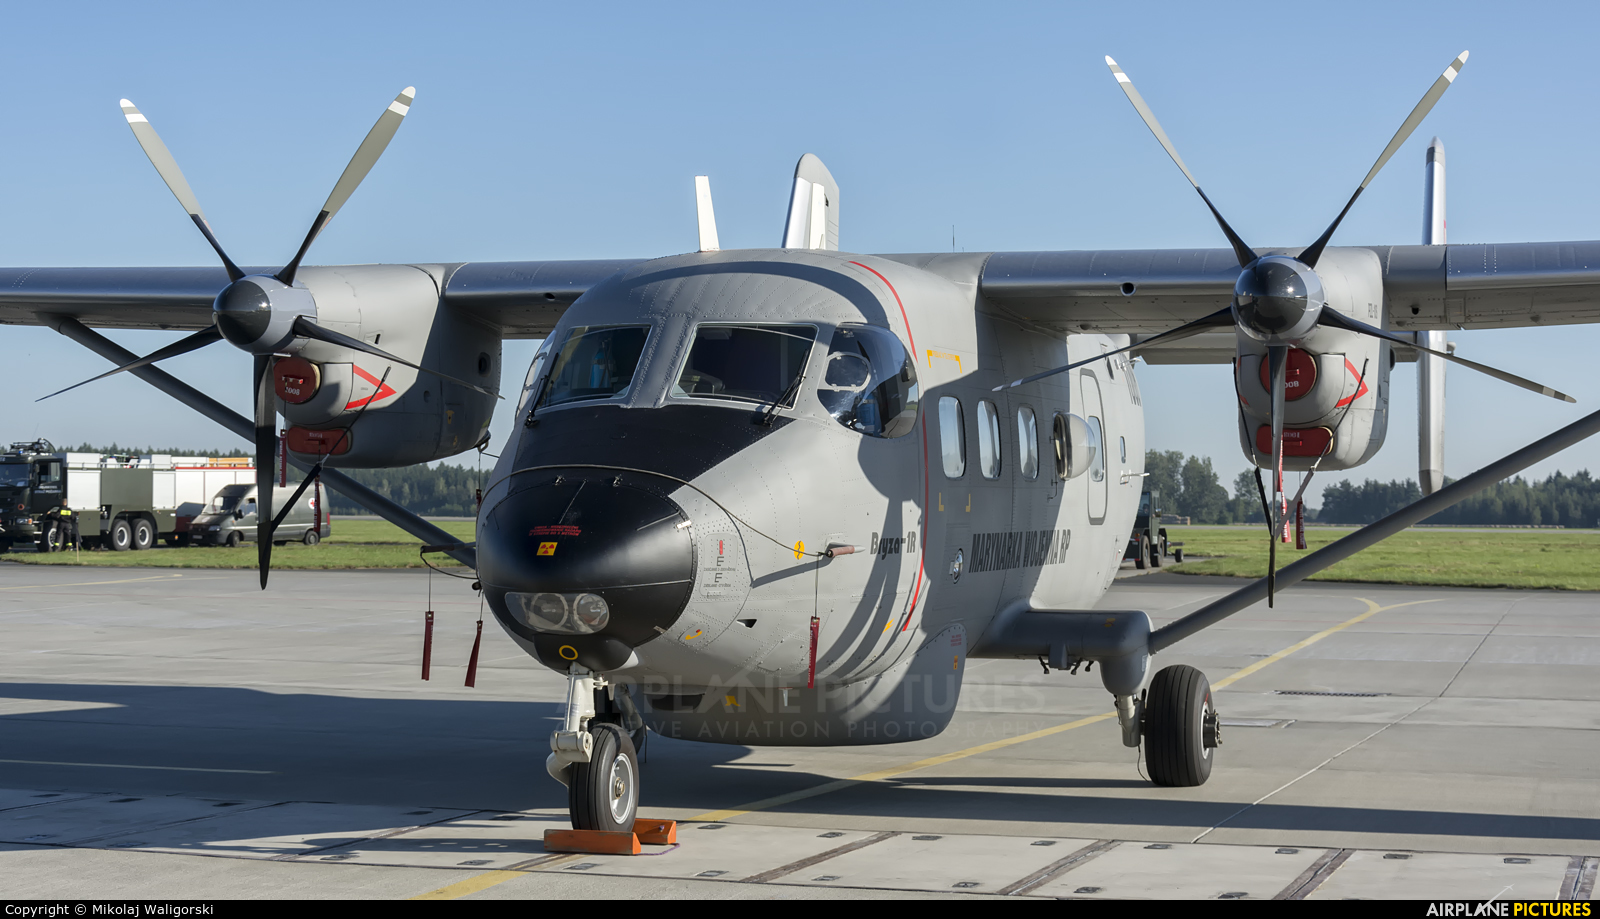 Poland - Navy 1008 aircraft at Poznań - Krzesiny